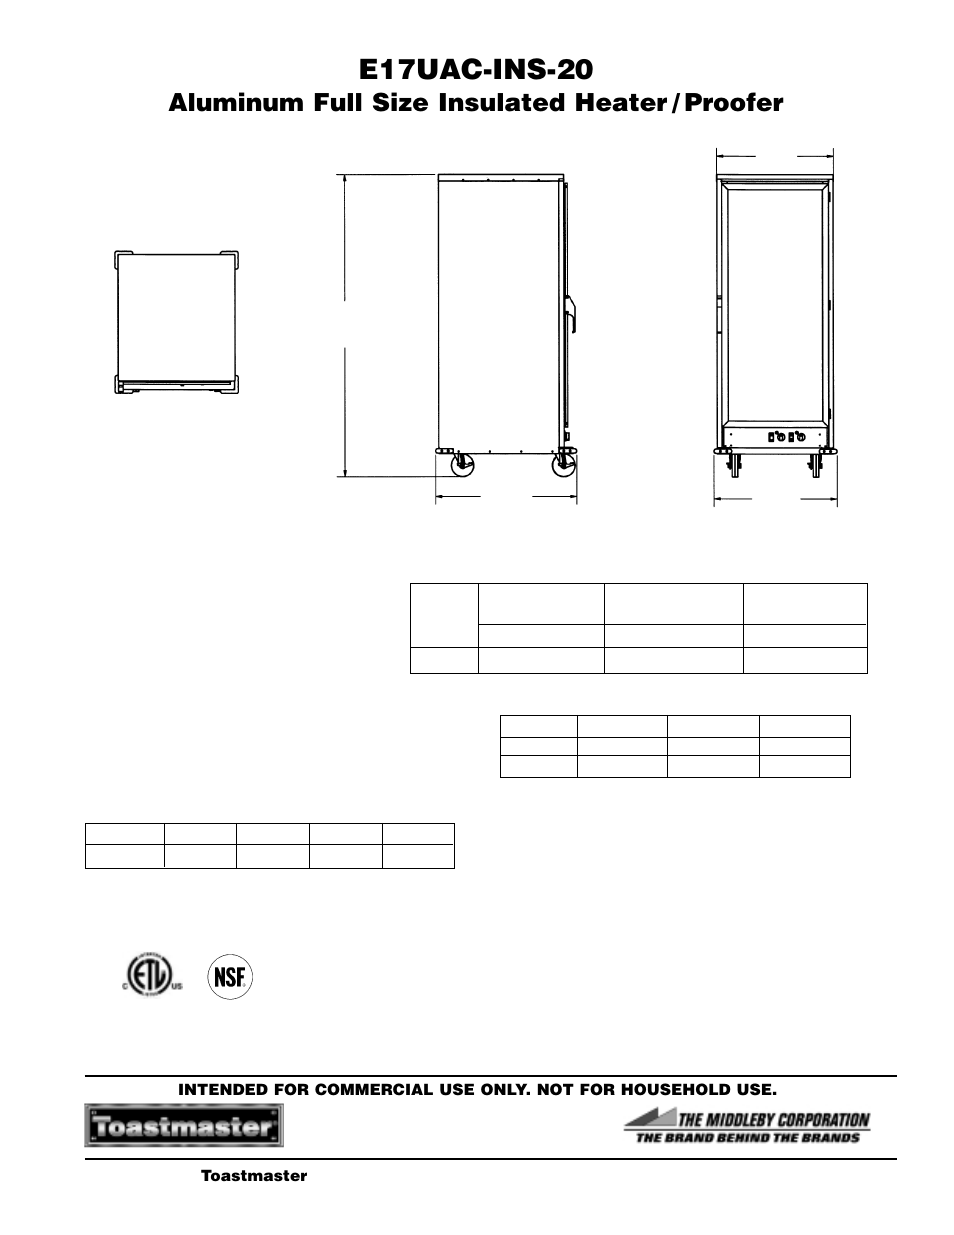 toastmaster roaster wiring diagram schematics wiring diagrams u2022 rh seniorlivinguniversity co Oven Plug Wiring Microwave Oven Wiring Diagram